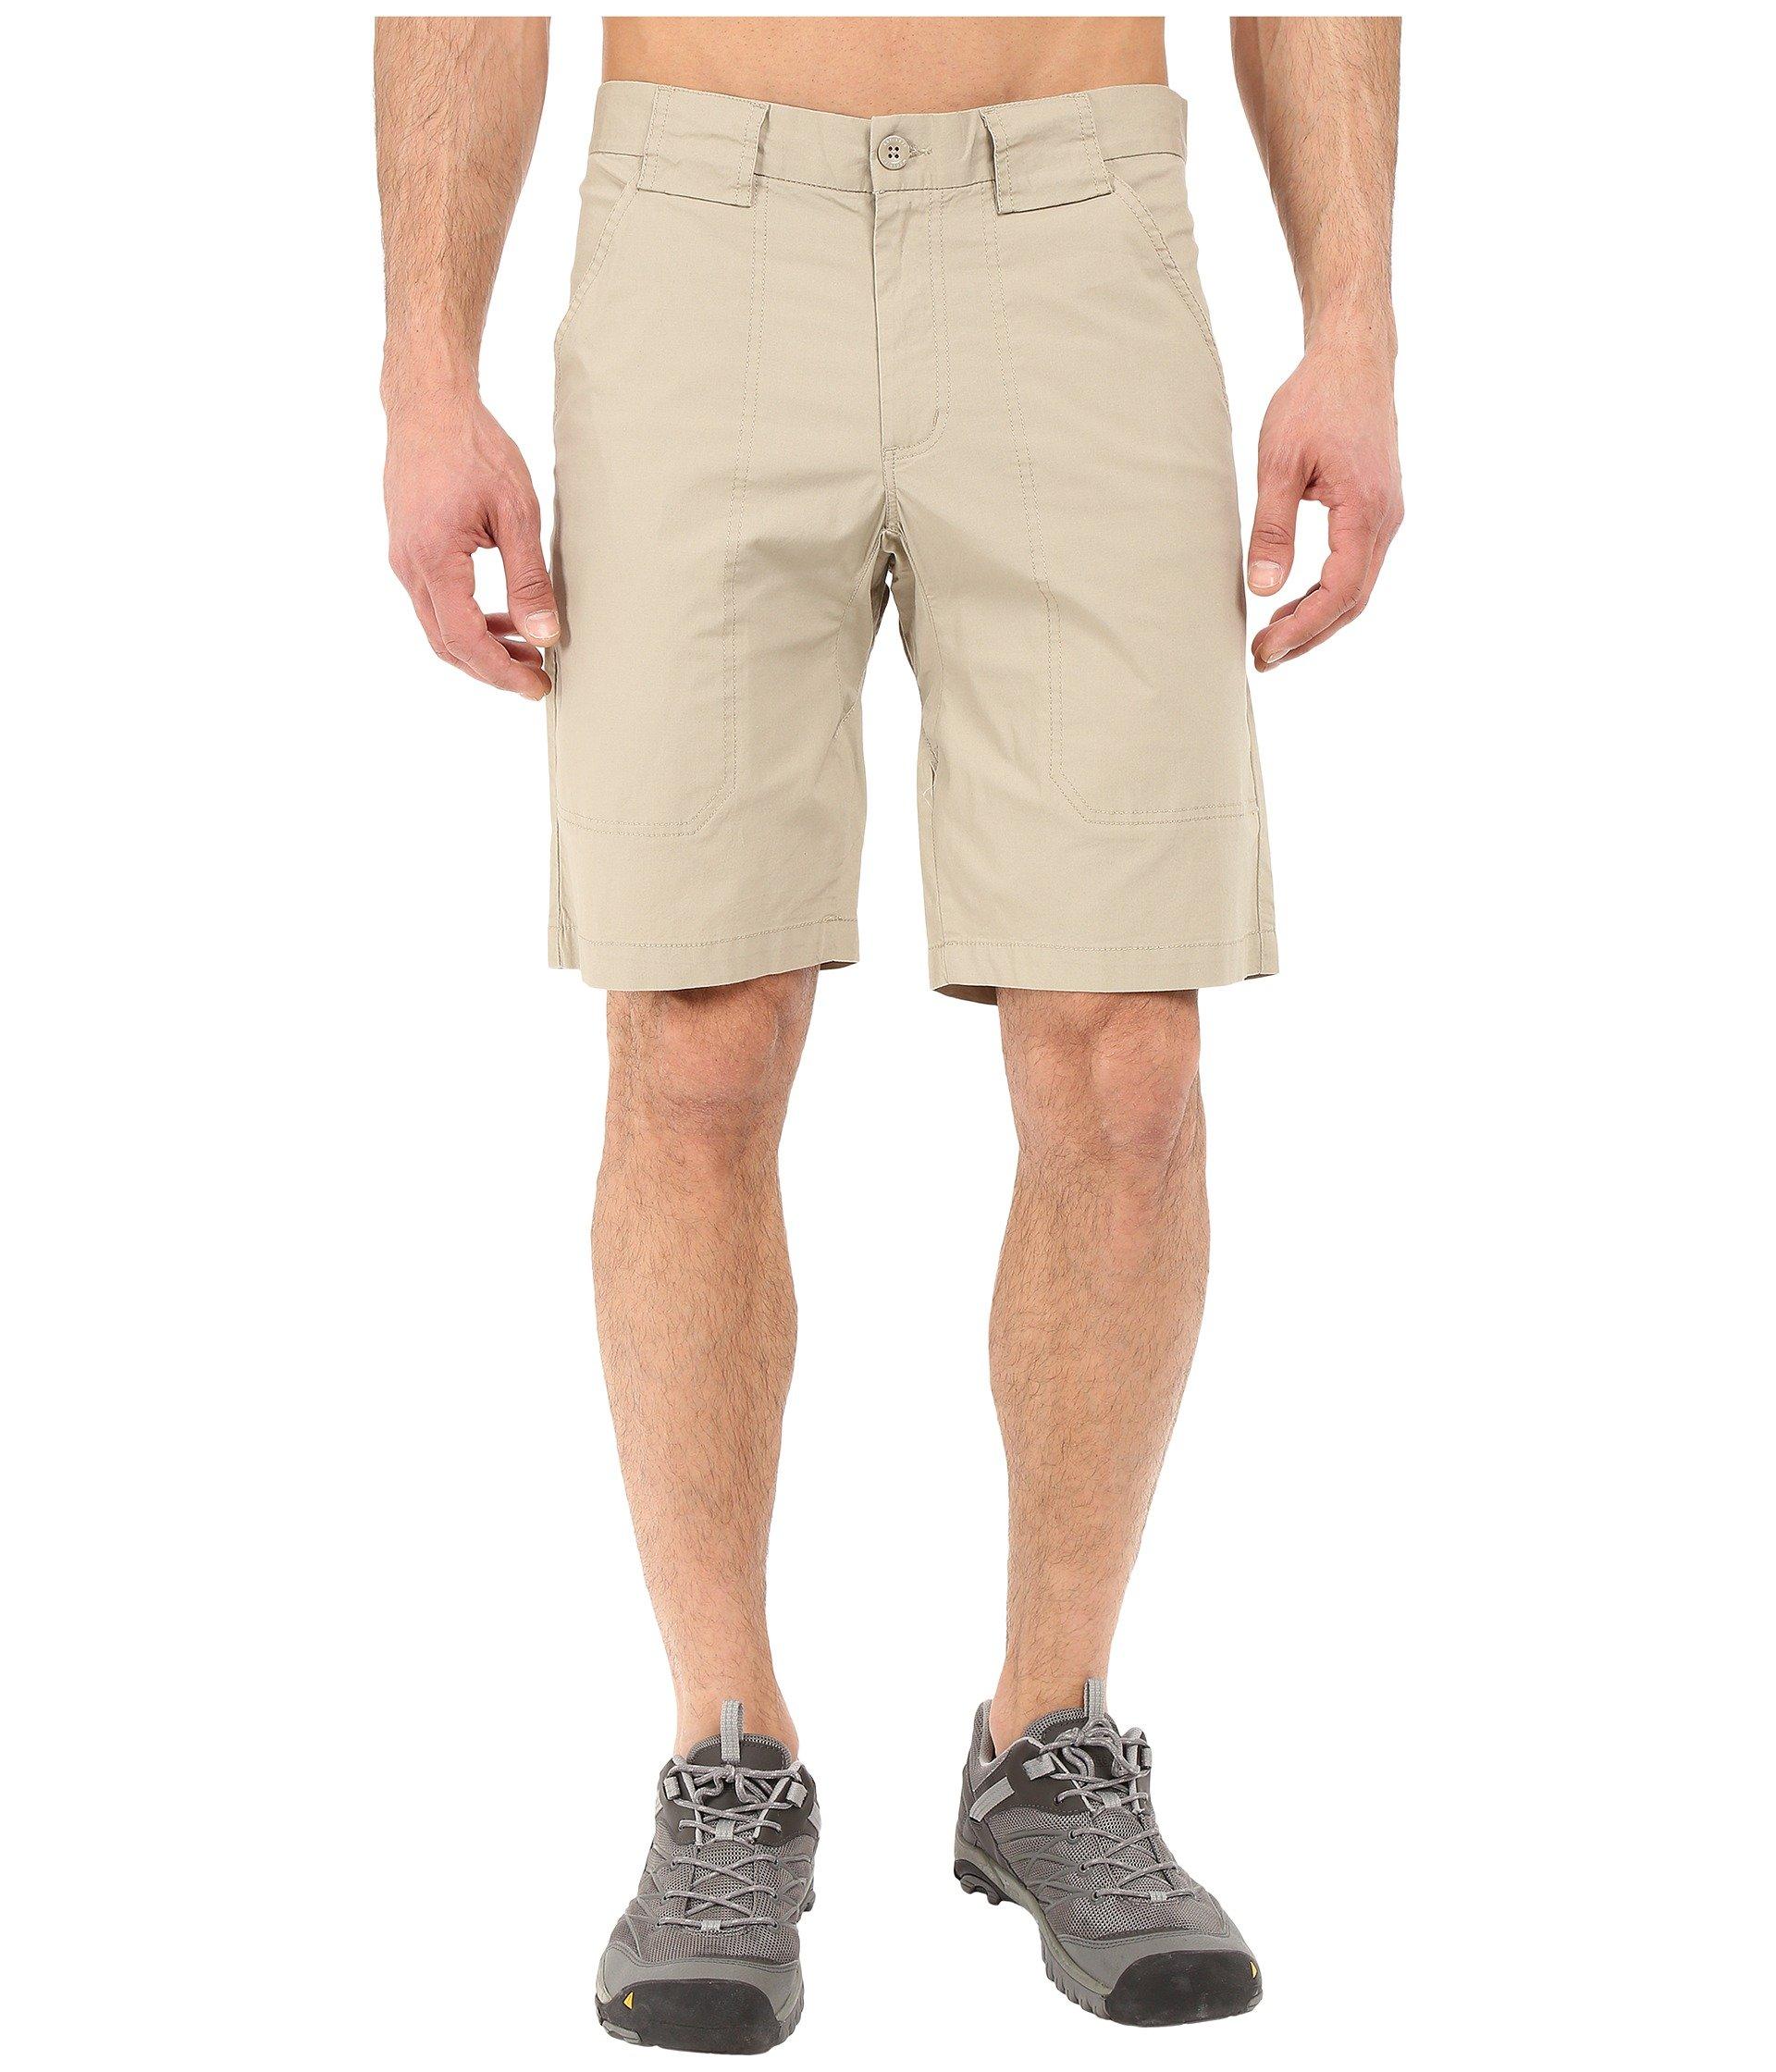 Pantaloneta para Hombre Woolrich Lighthouse Rock Utility Shorts  + Woolrich en VeoyCompro.net